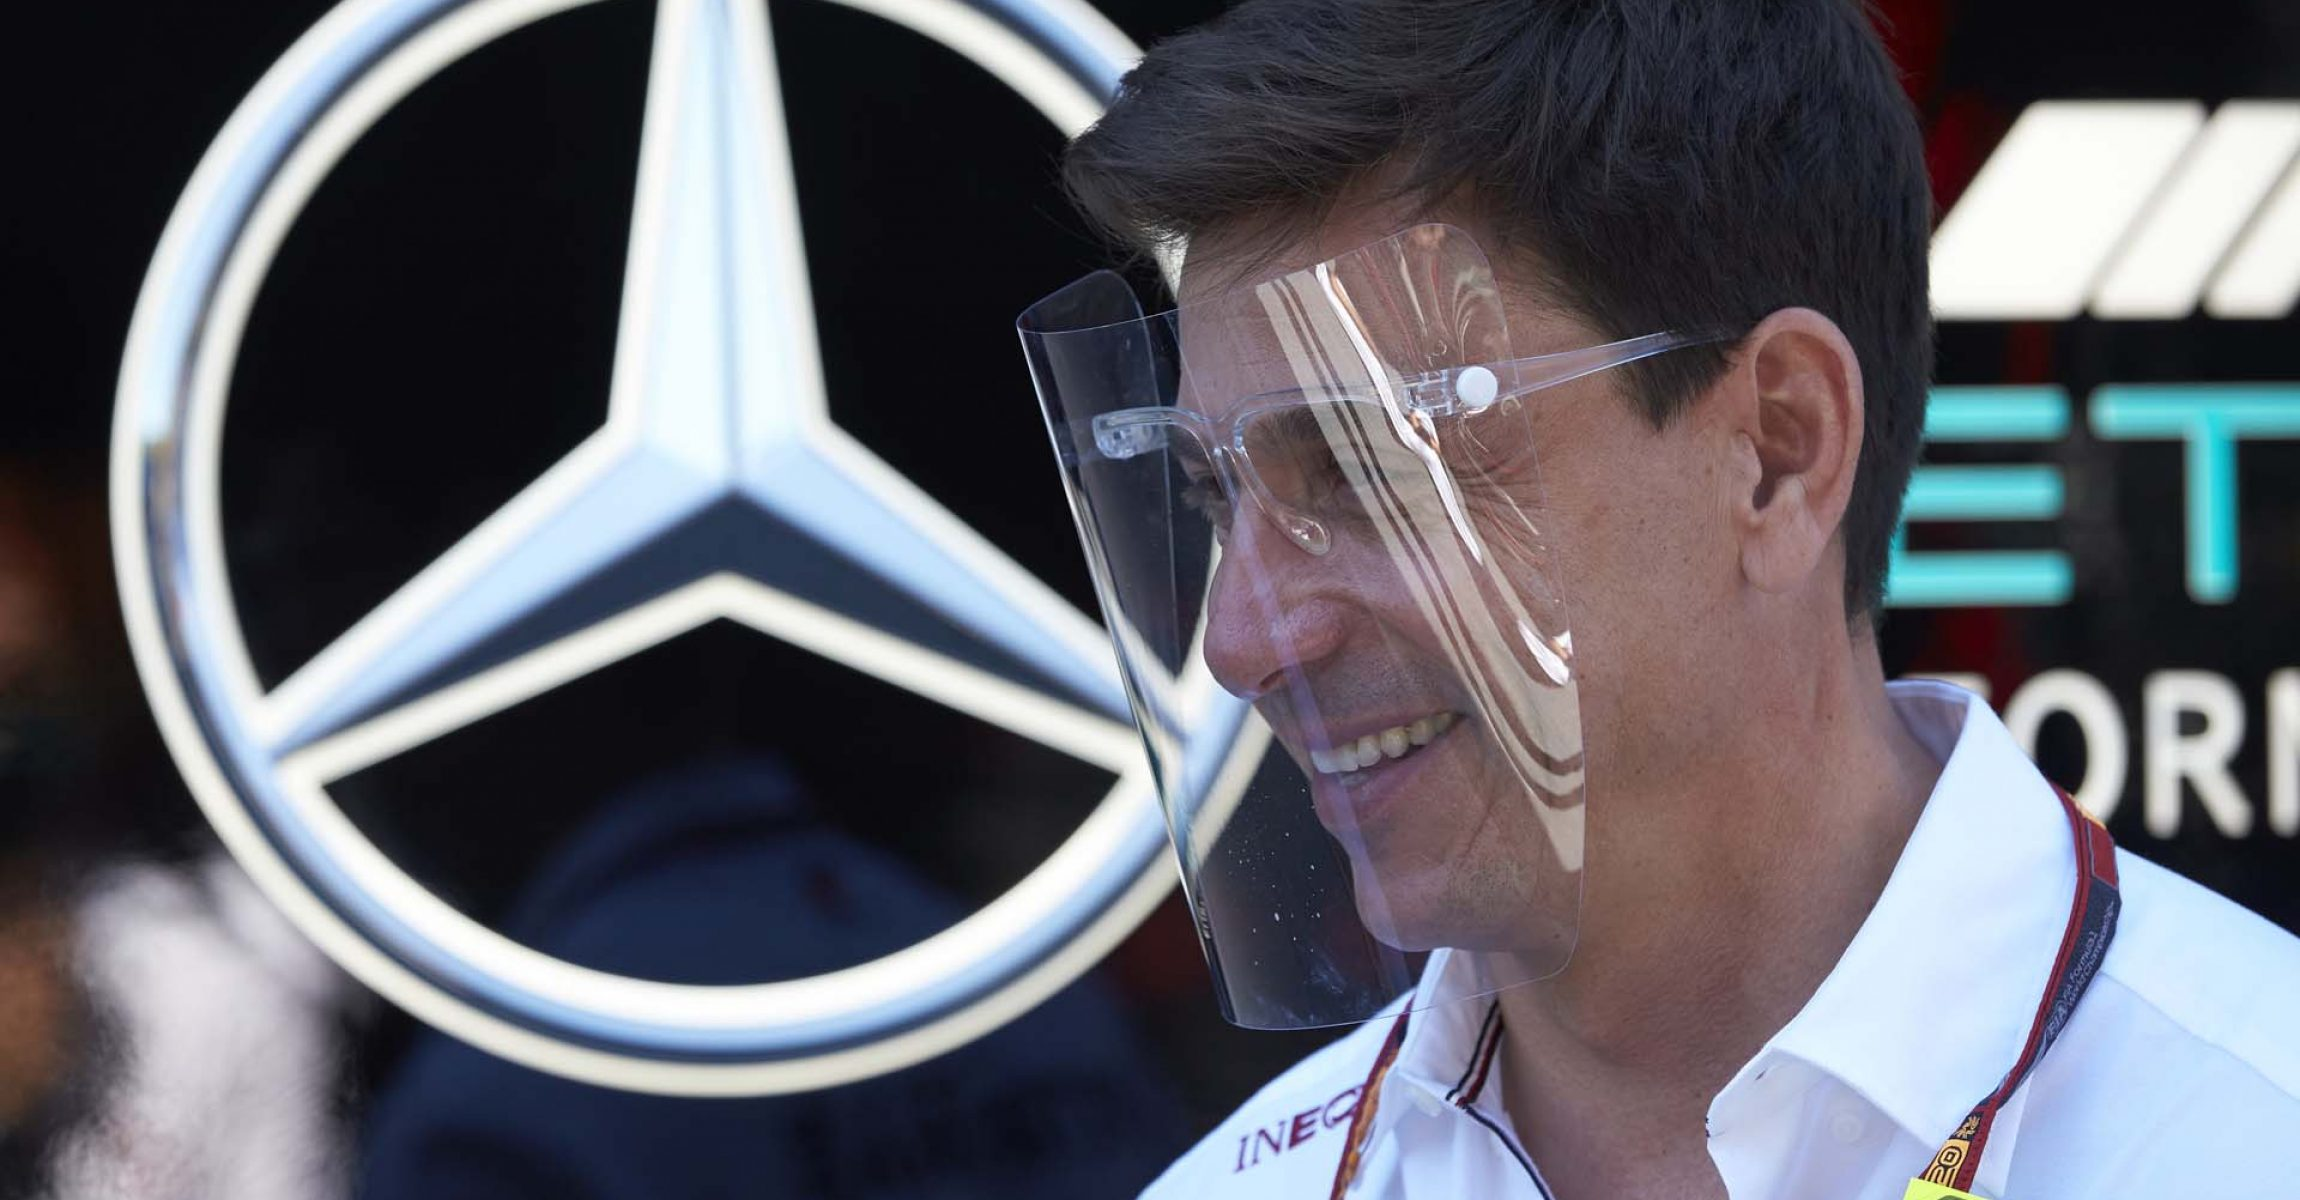 2020 Austrian Grand Prix, Sunday - Steve Etherington Toto Wolff Mercedes